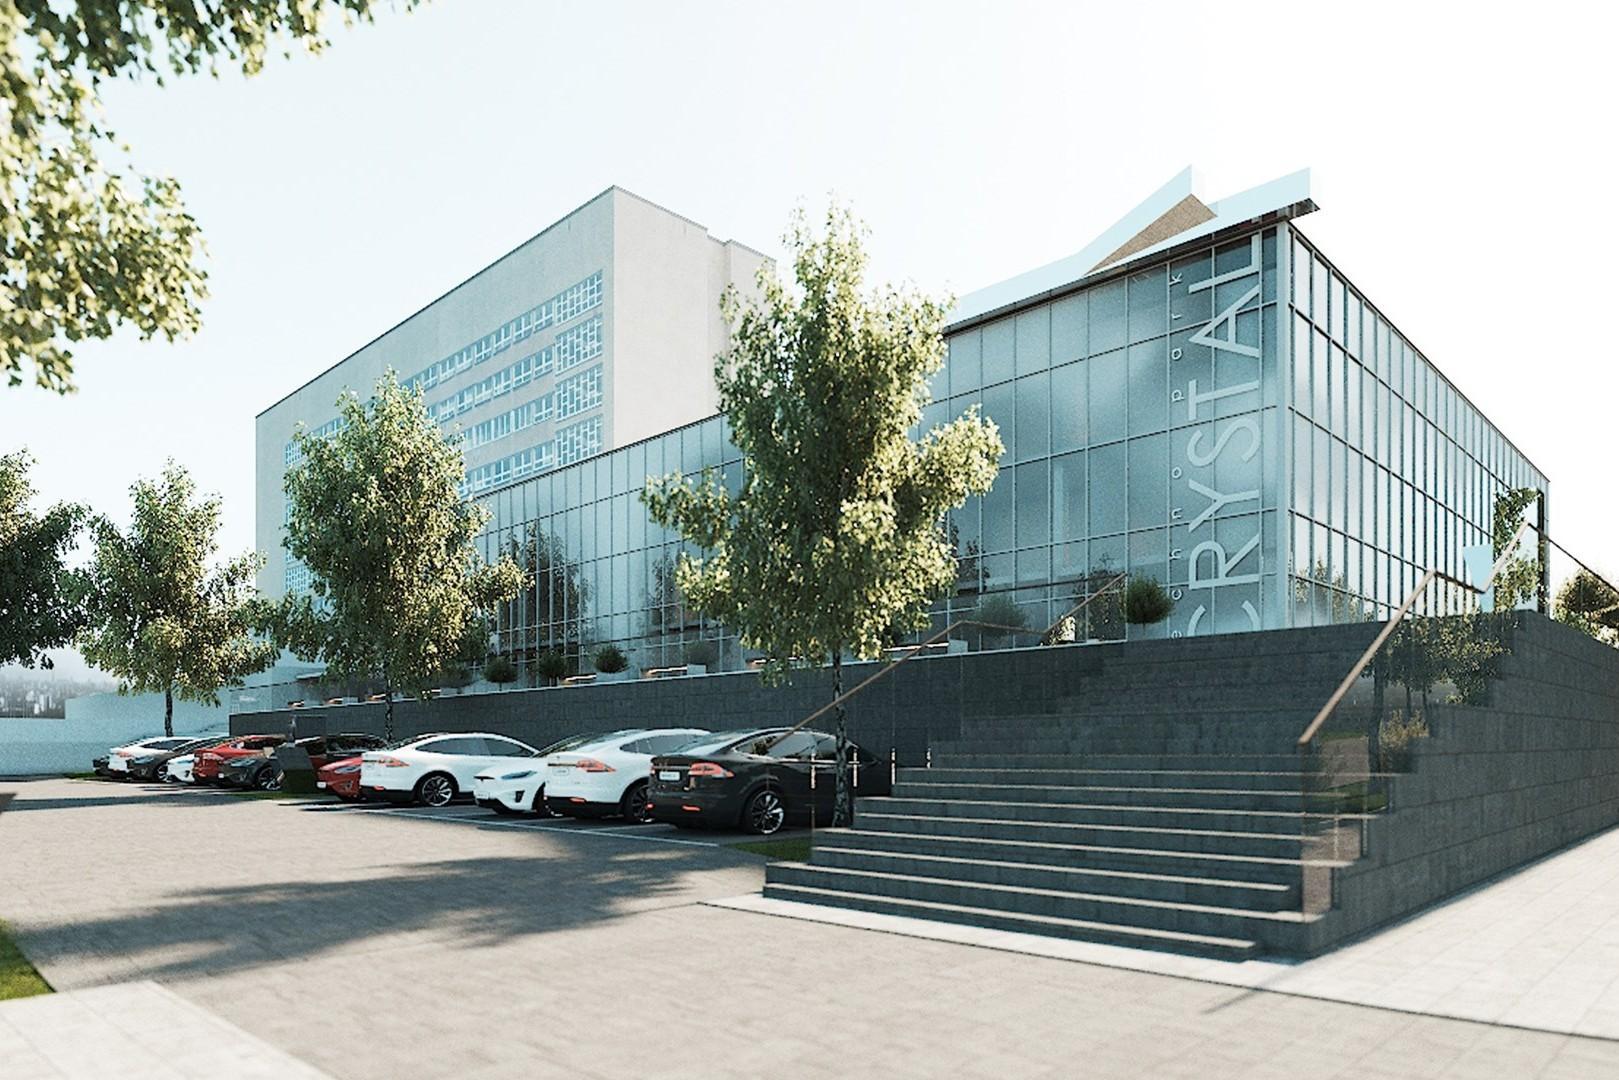 Vinnytsia approves Crystal Innovation and Technology Park Development Concept